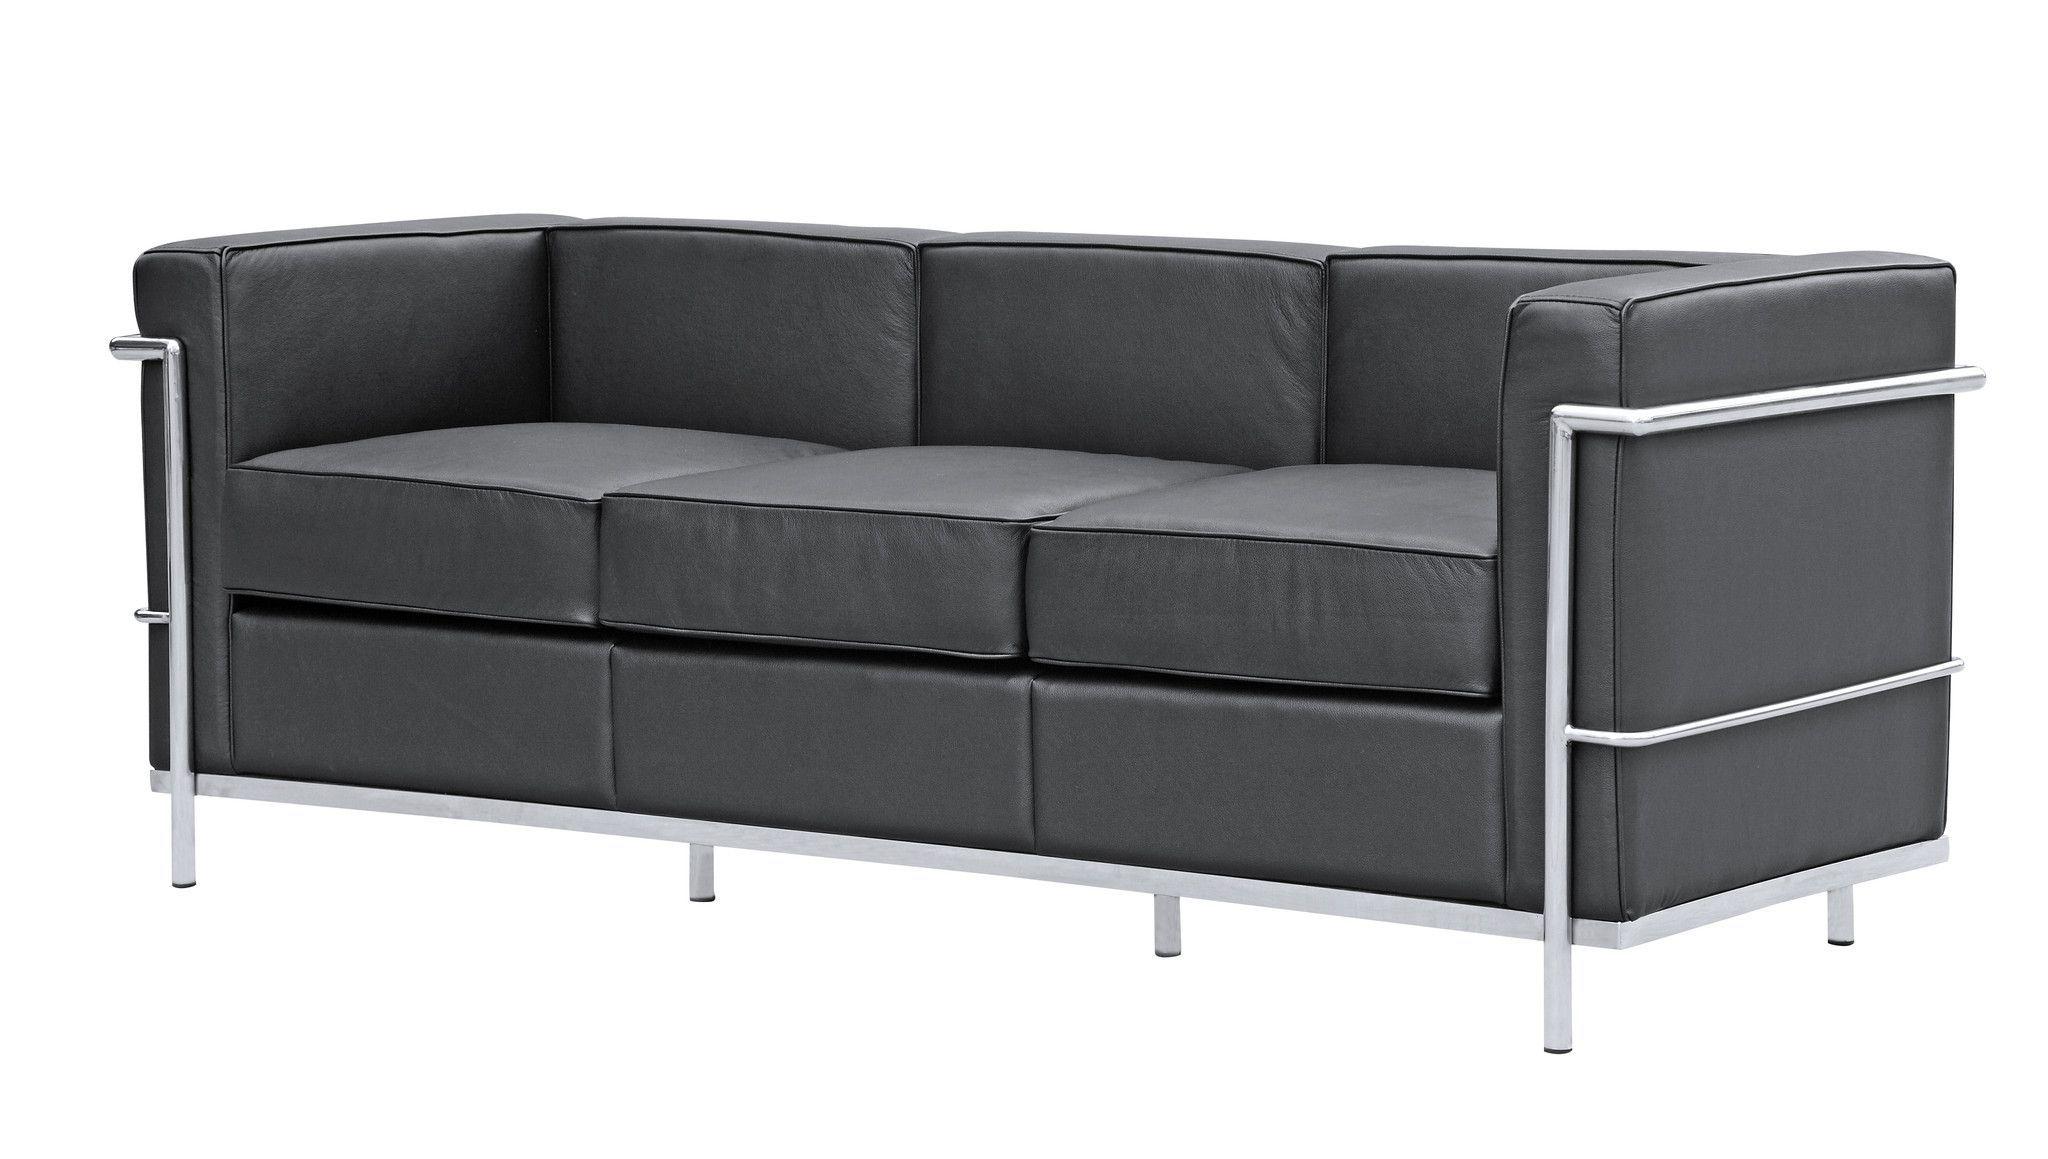 Cube Le Corbusier Lc2 Style Petit Sofa, Black Leather